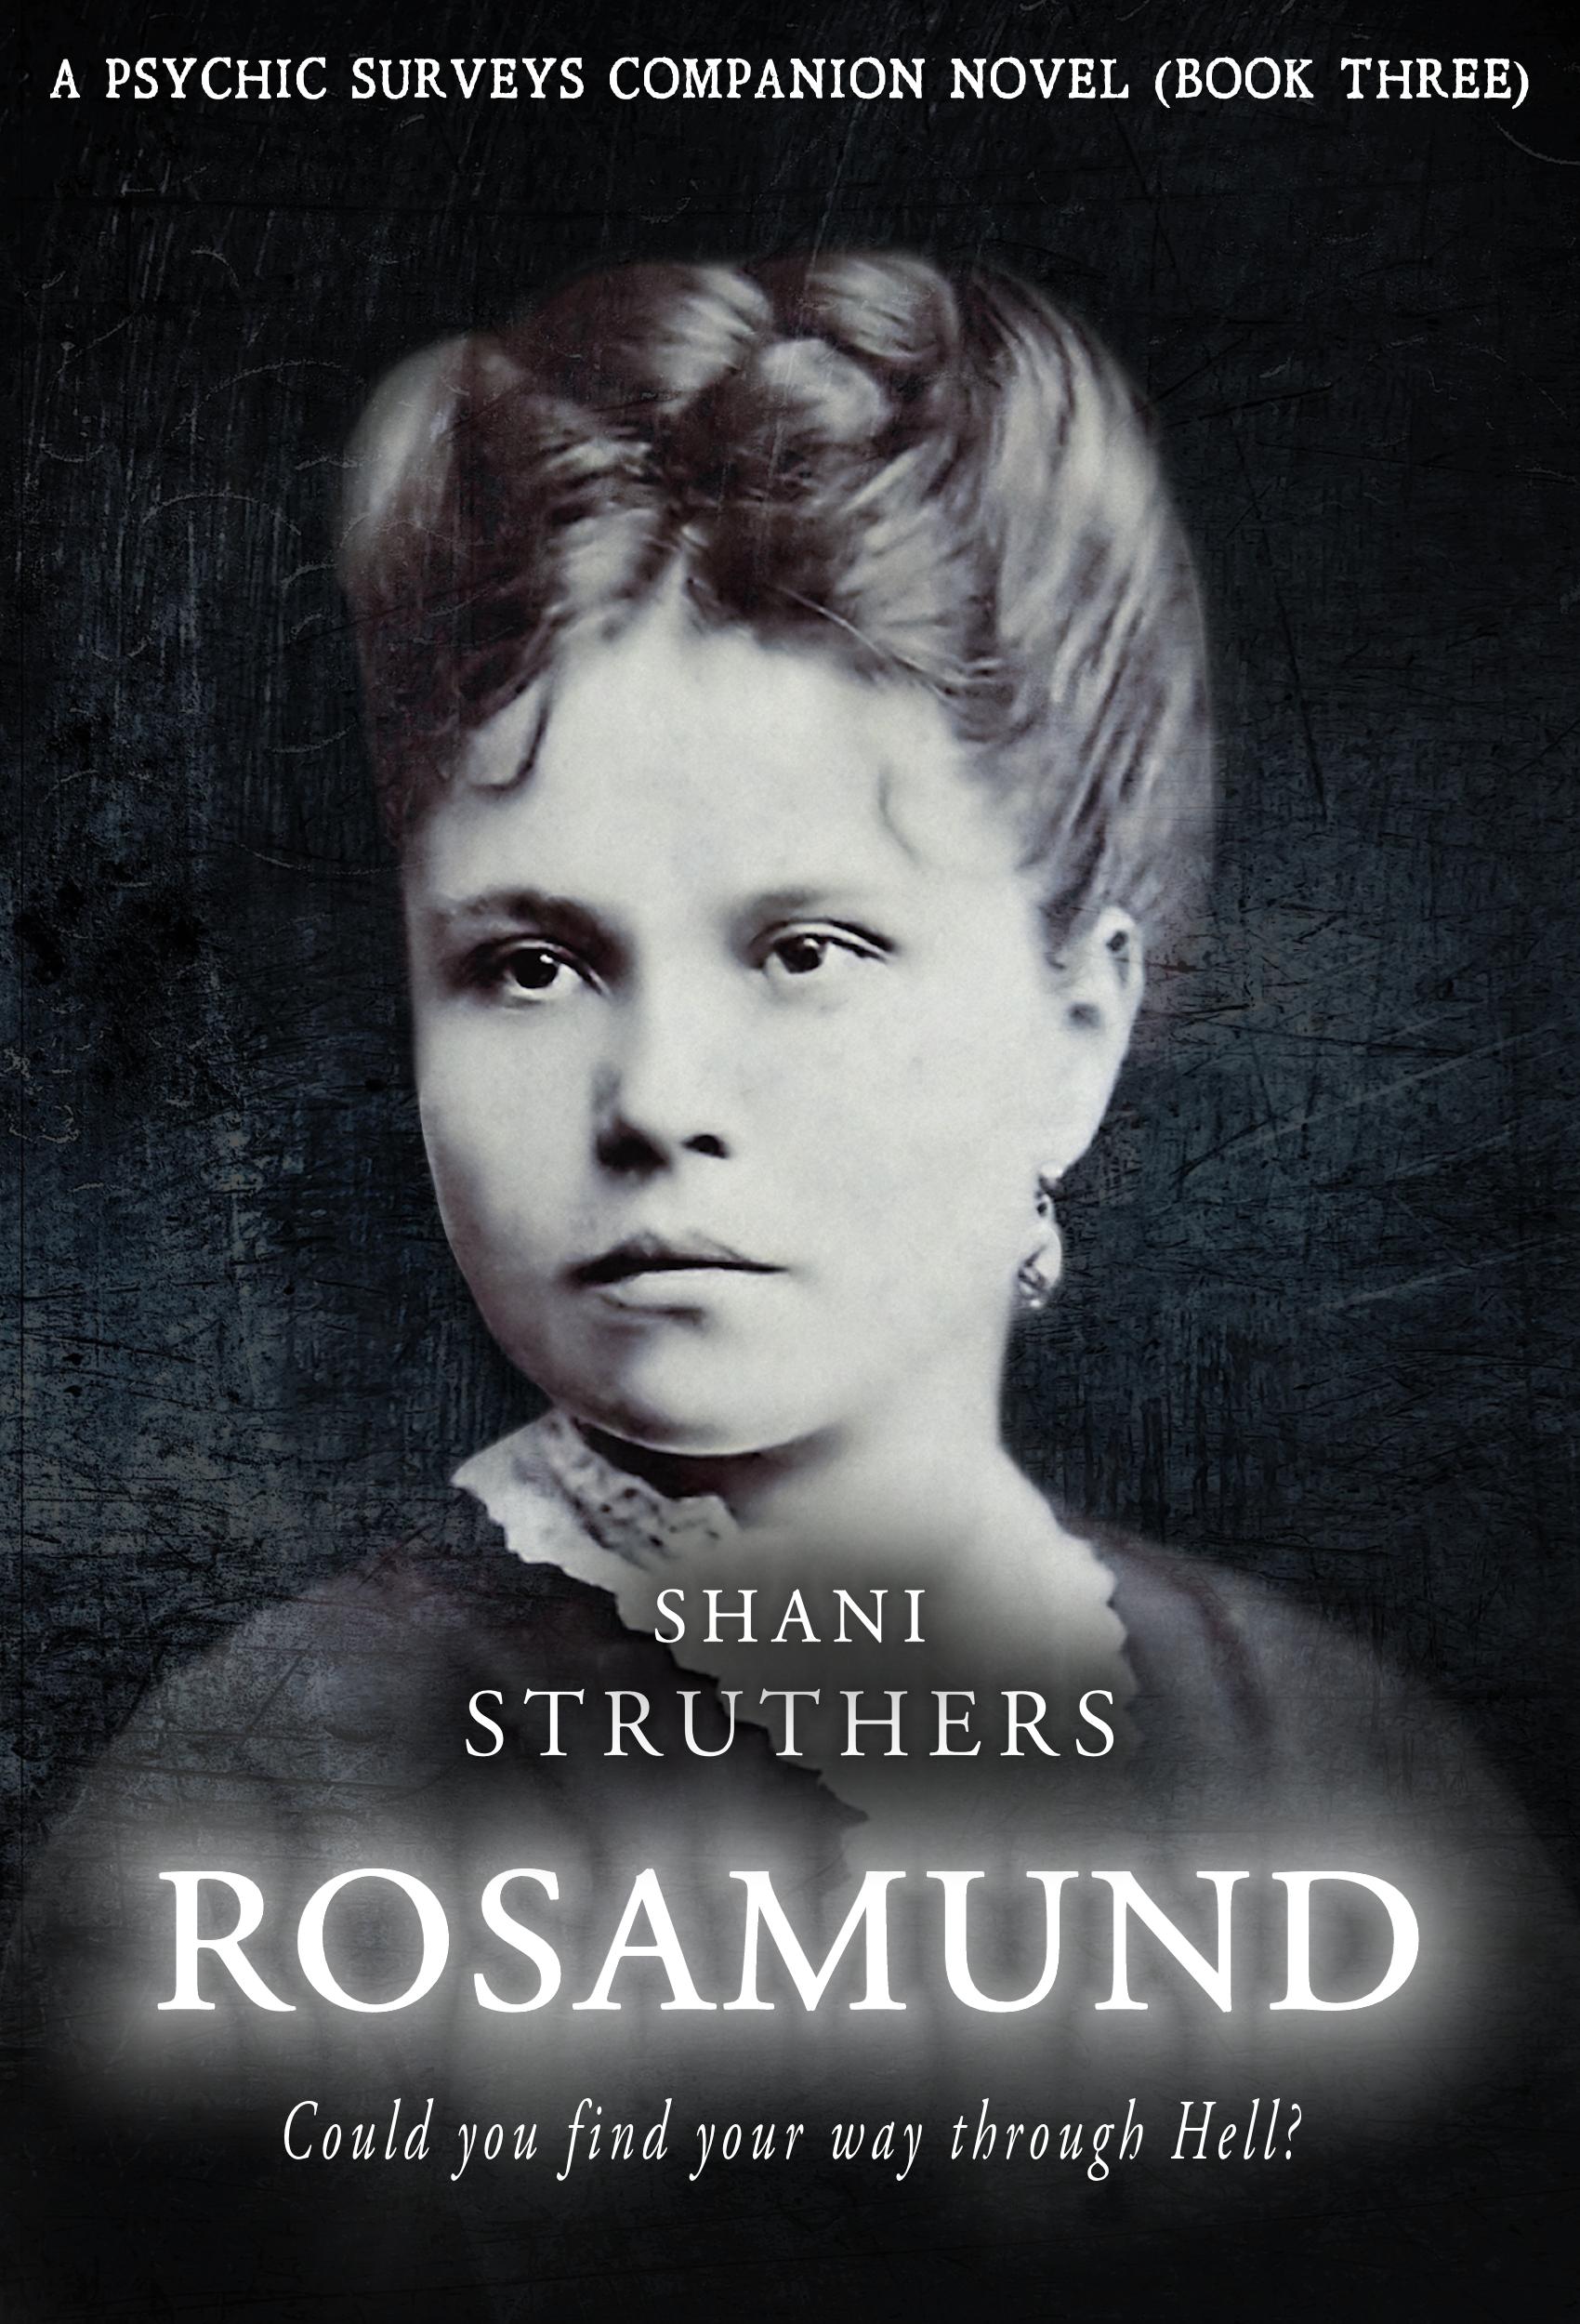 Rosamund by Shani Struthers